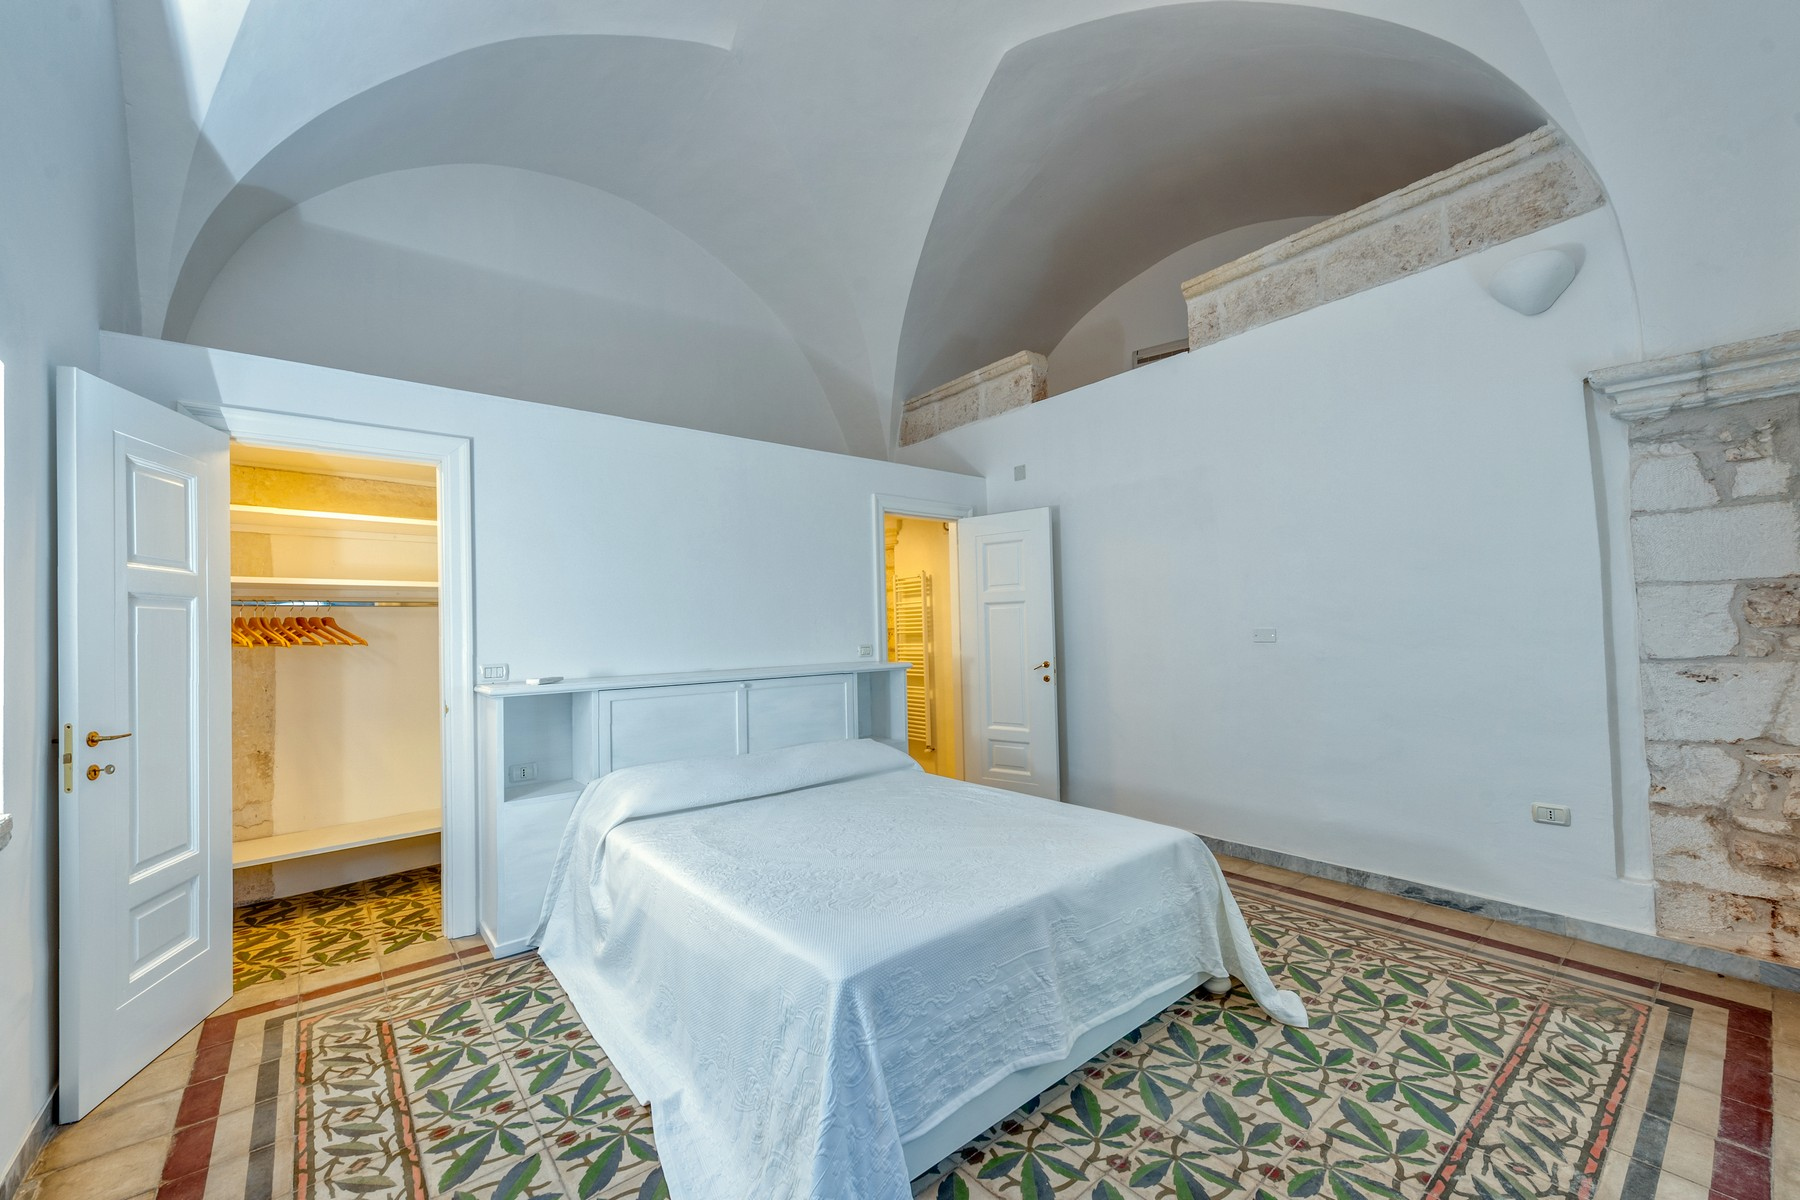 Appartamento in Vendita a Ostuni: 5 locali, 265 mq - Foto 24